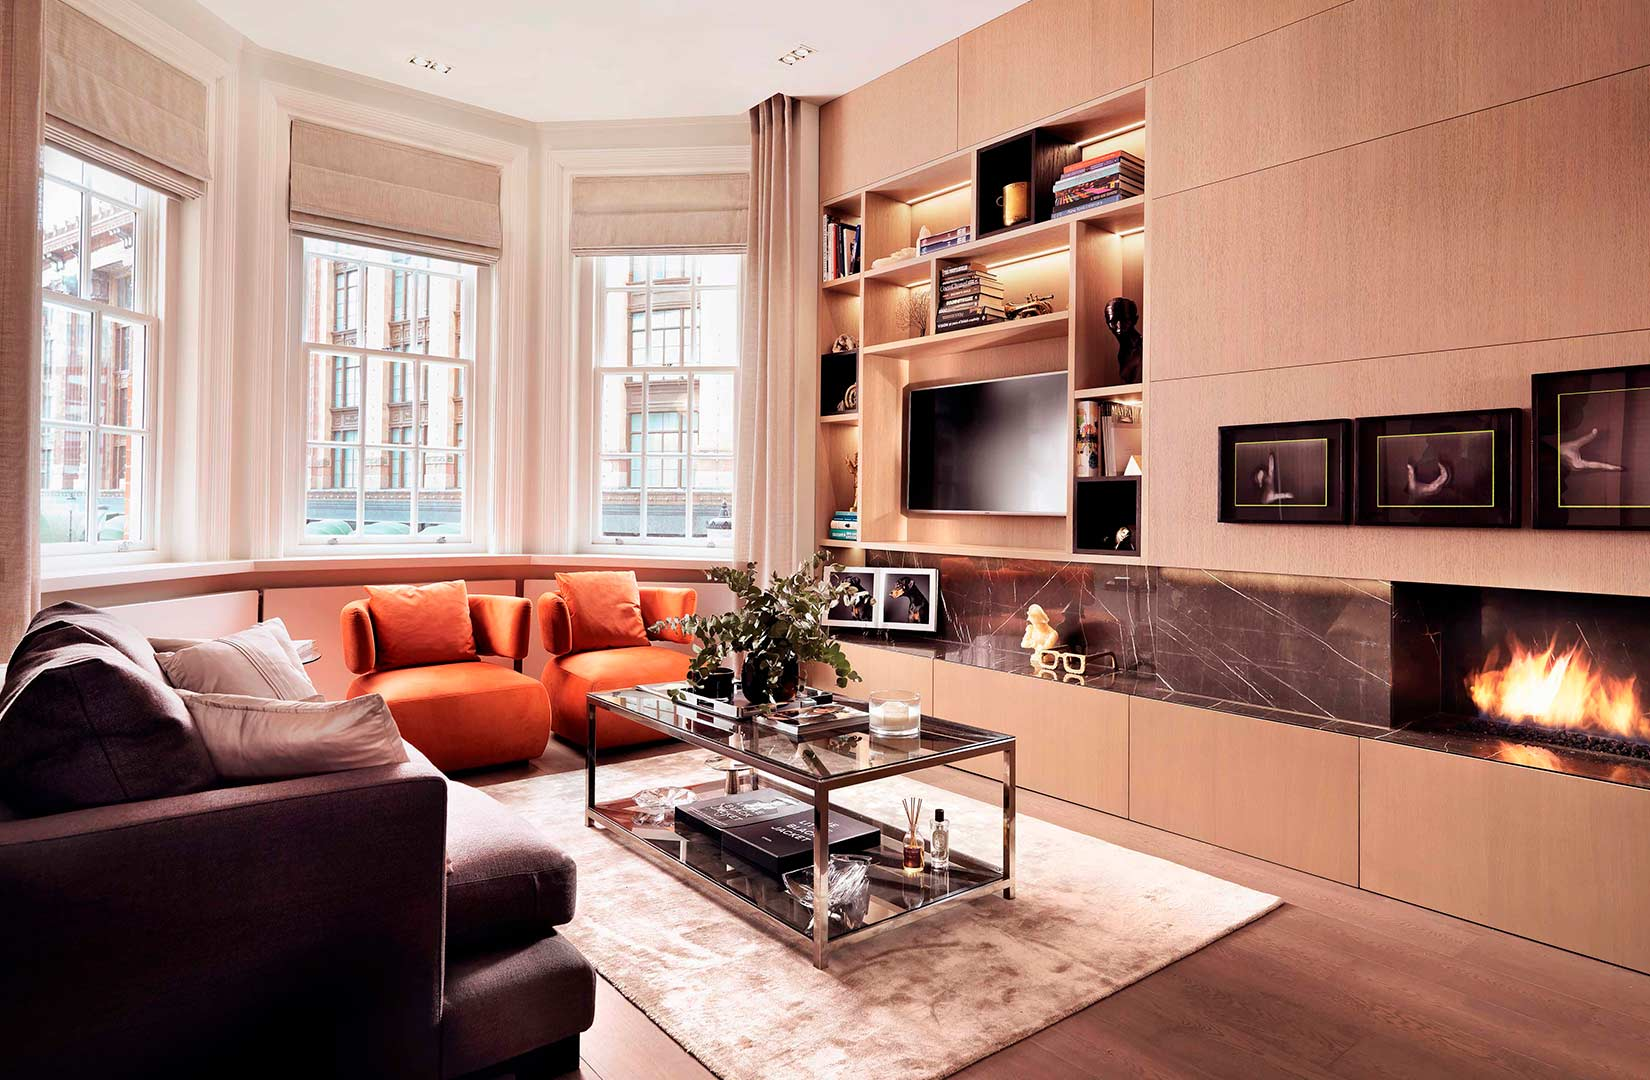 Knightsbridge, London: Living room